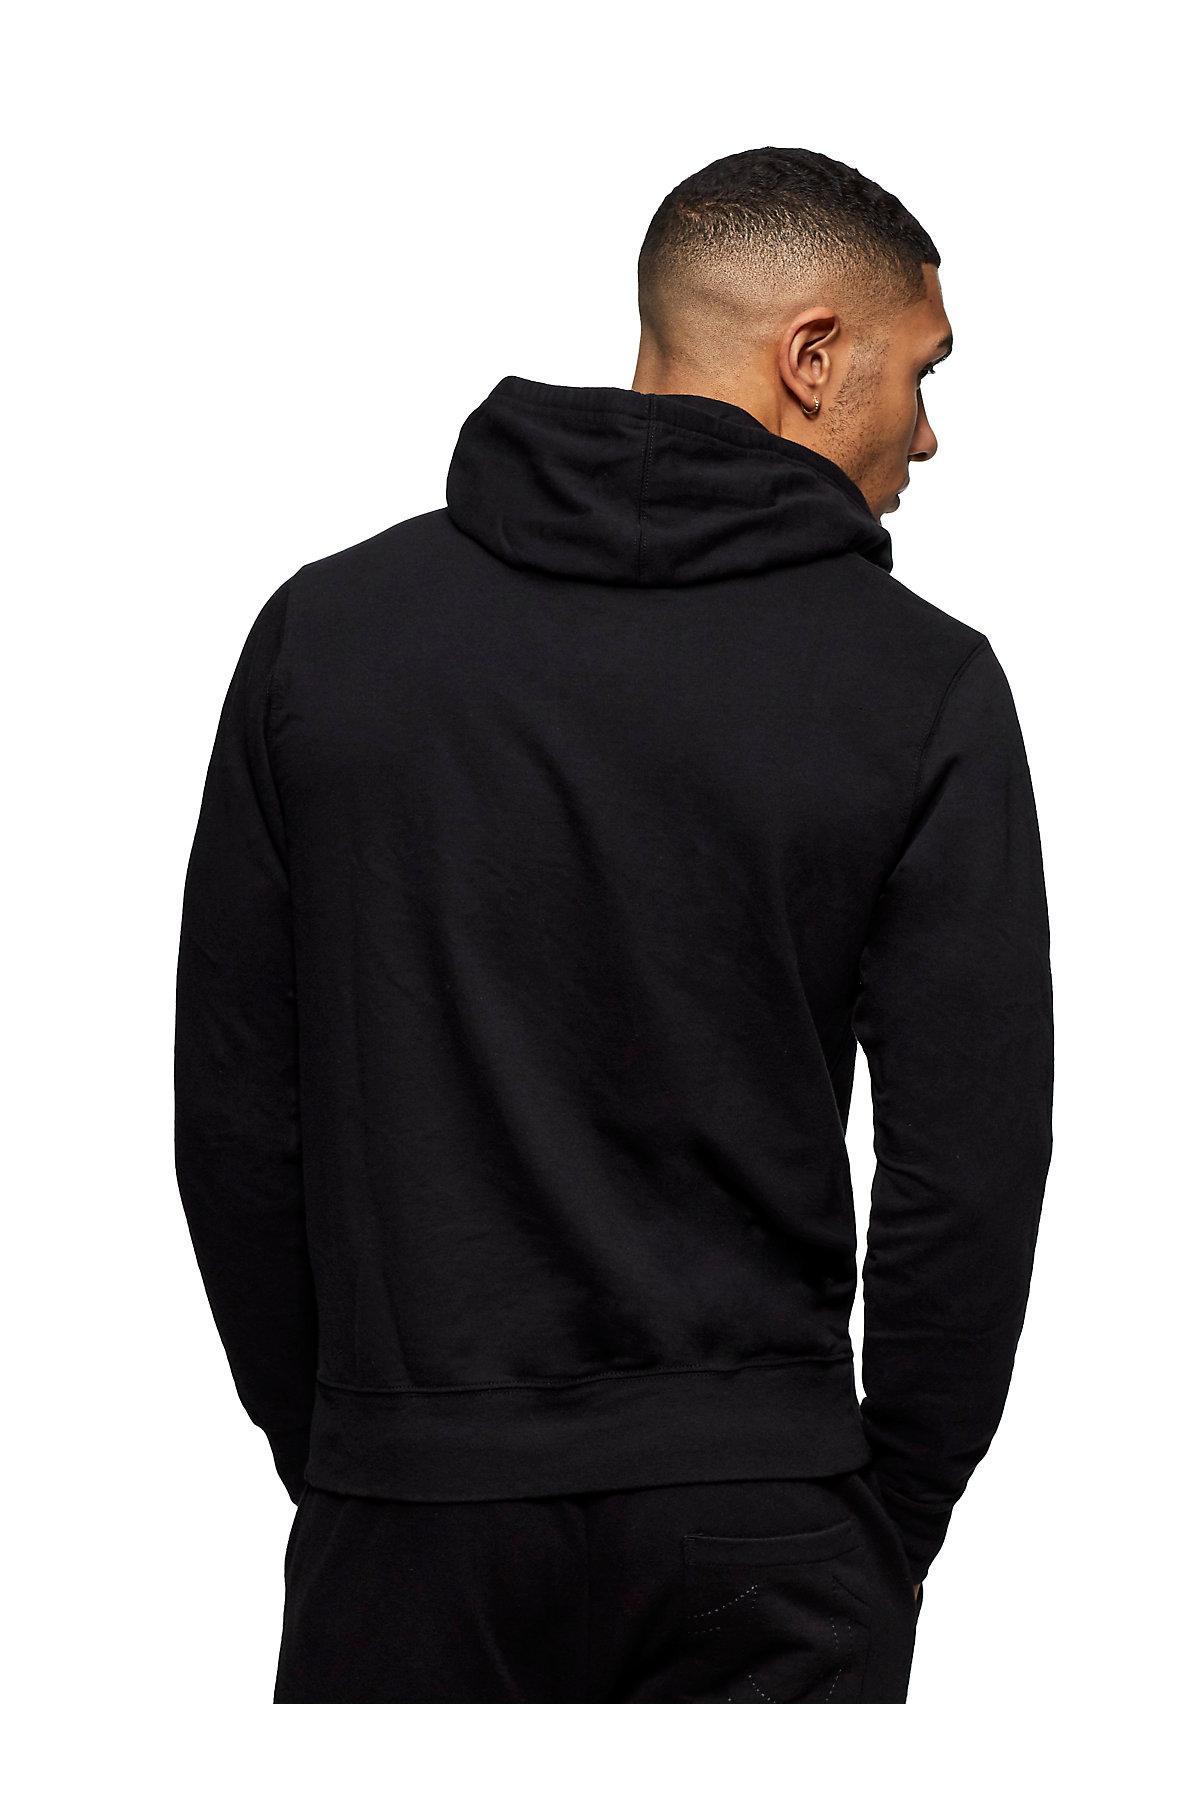 True-Religion-Men-039-s-Mirror-Logo-Reflection-Pullover-Hoodie-Sweatshirt thumbnail 9